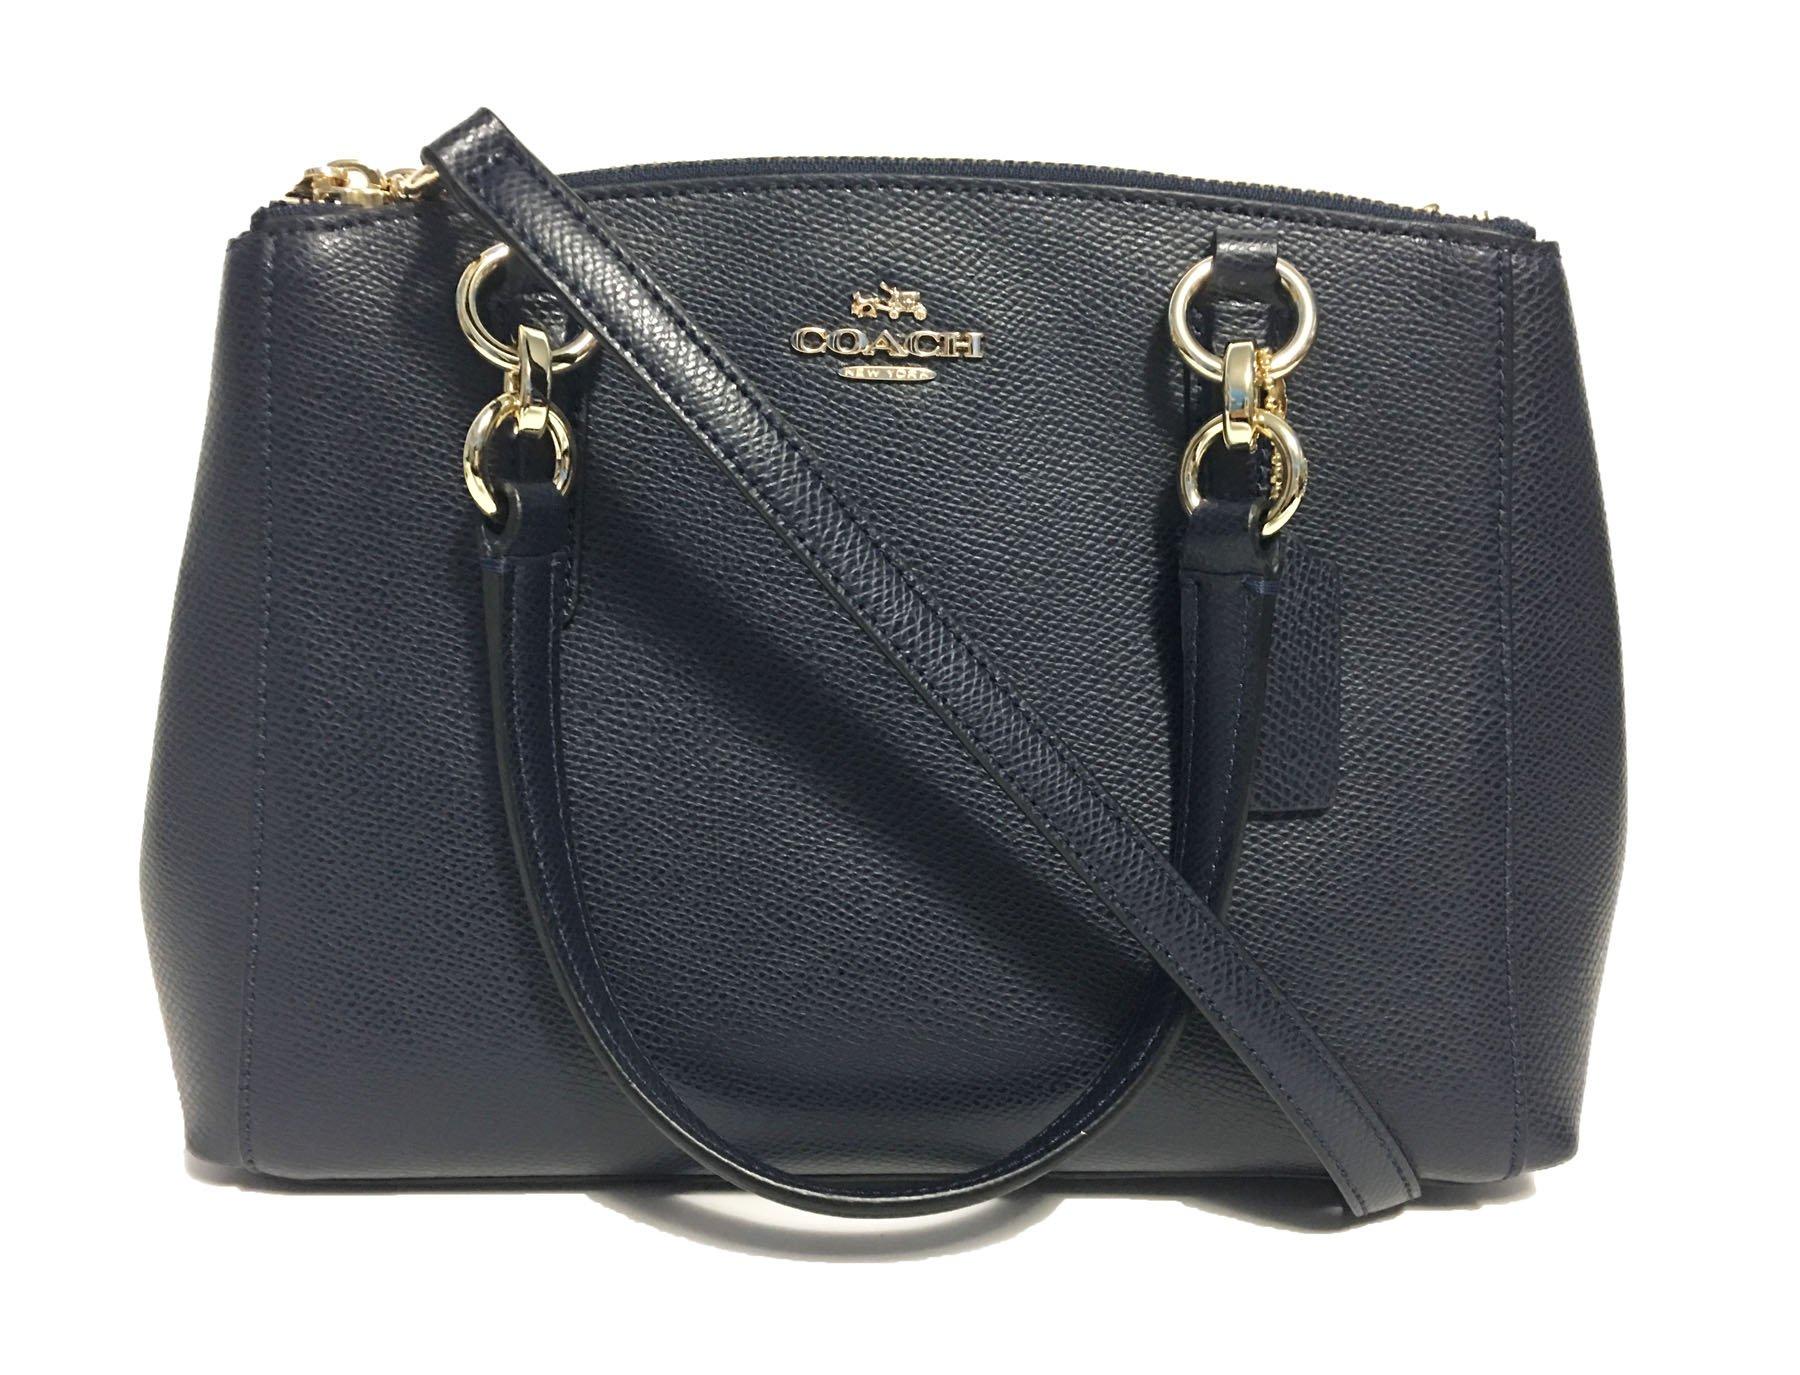 Coach Mini Christie Carryall in Crossgrain Leather in Midnight Blue